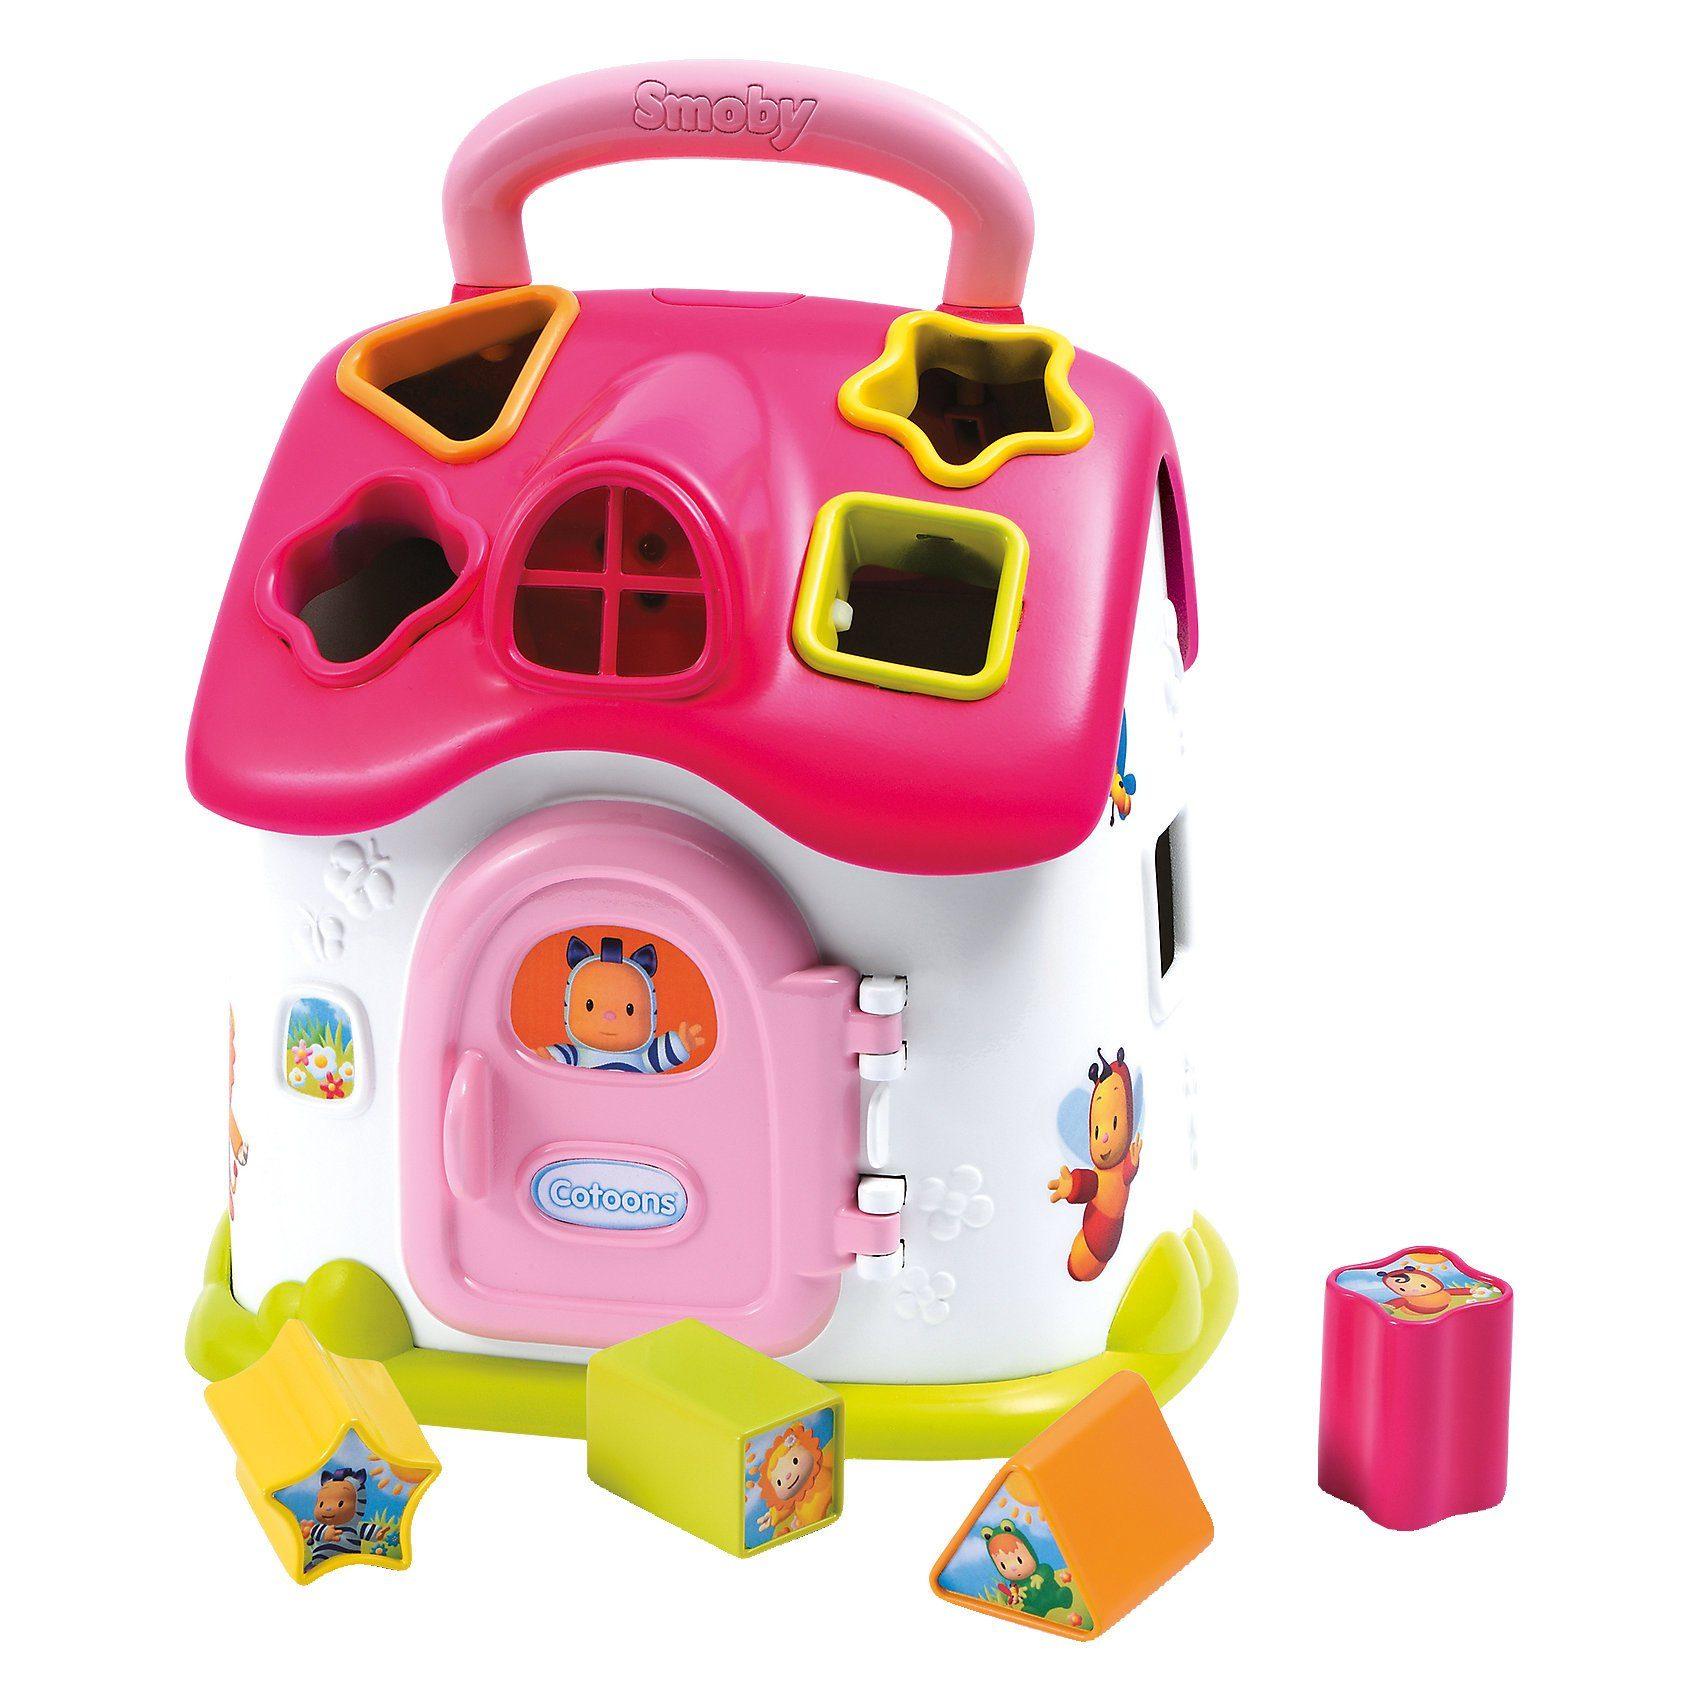 Smoby Cotoons Elektrisches Steckspielhaus, rosa